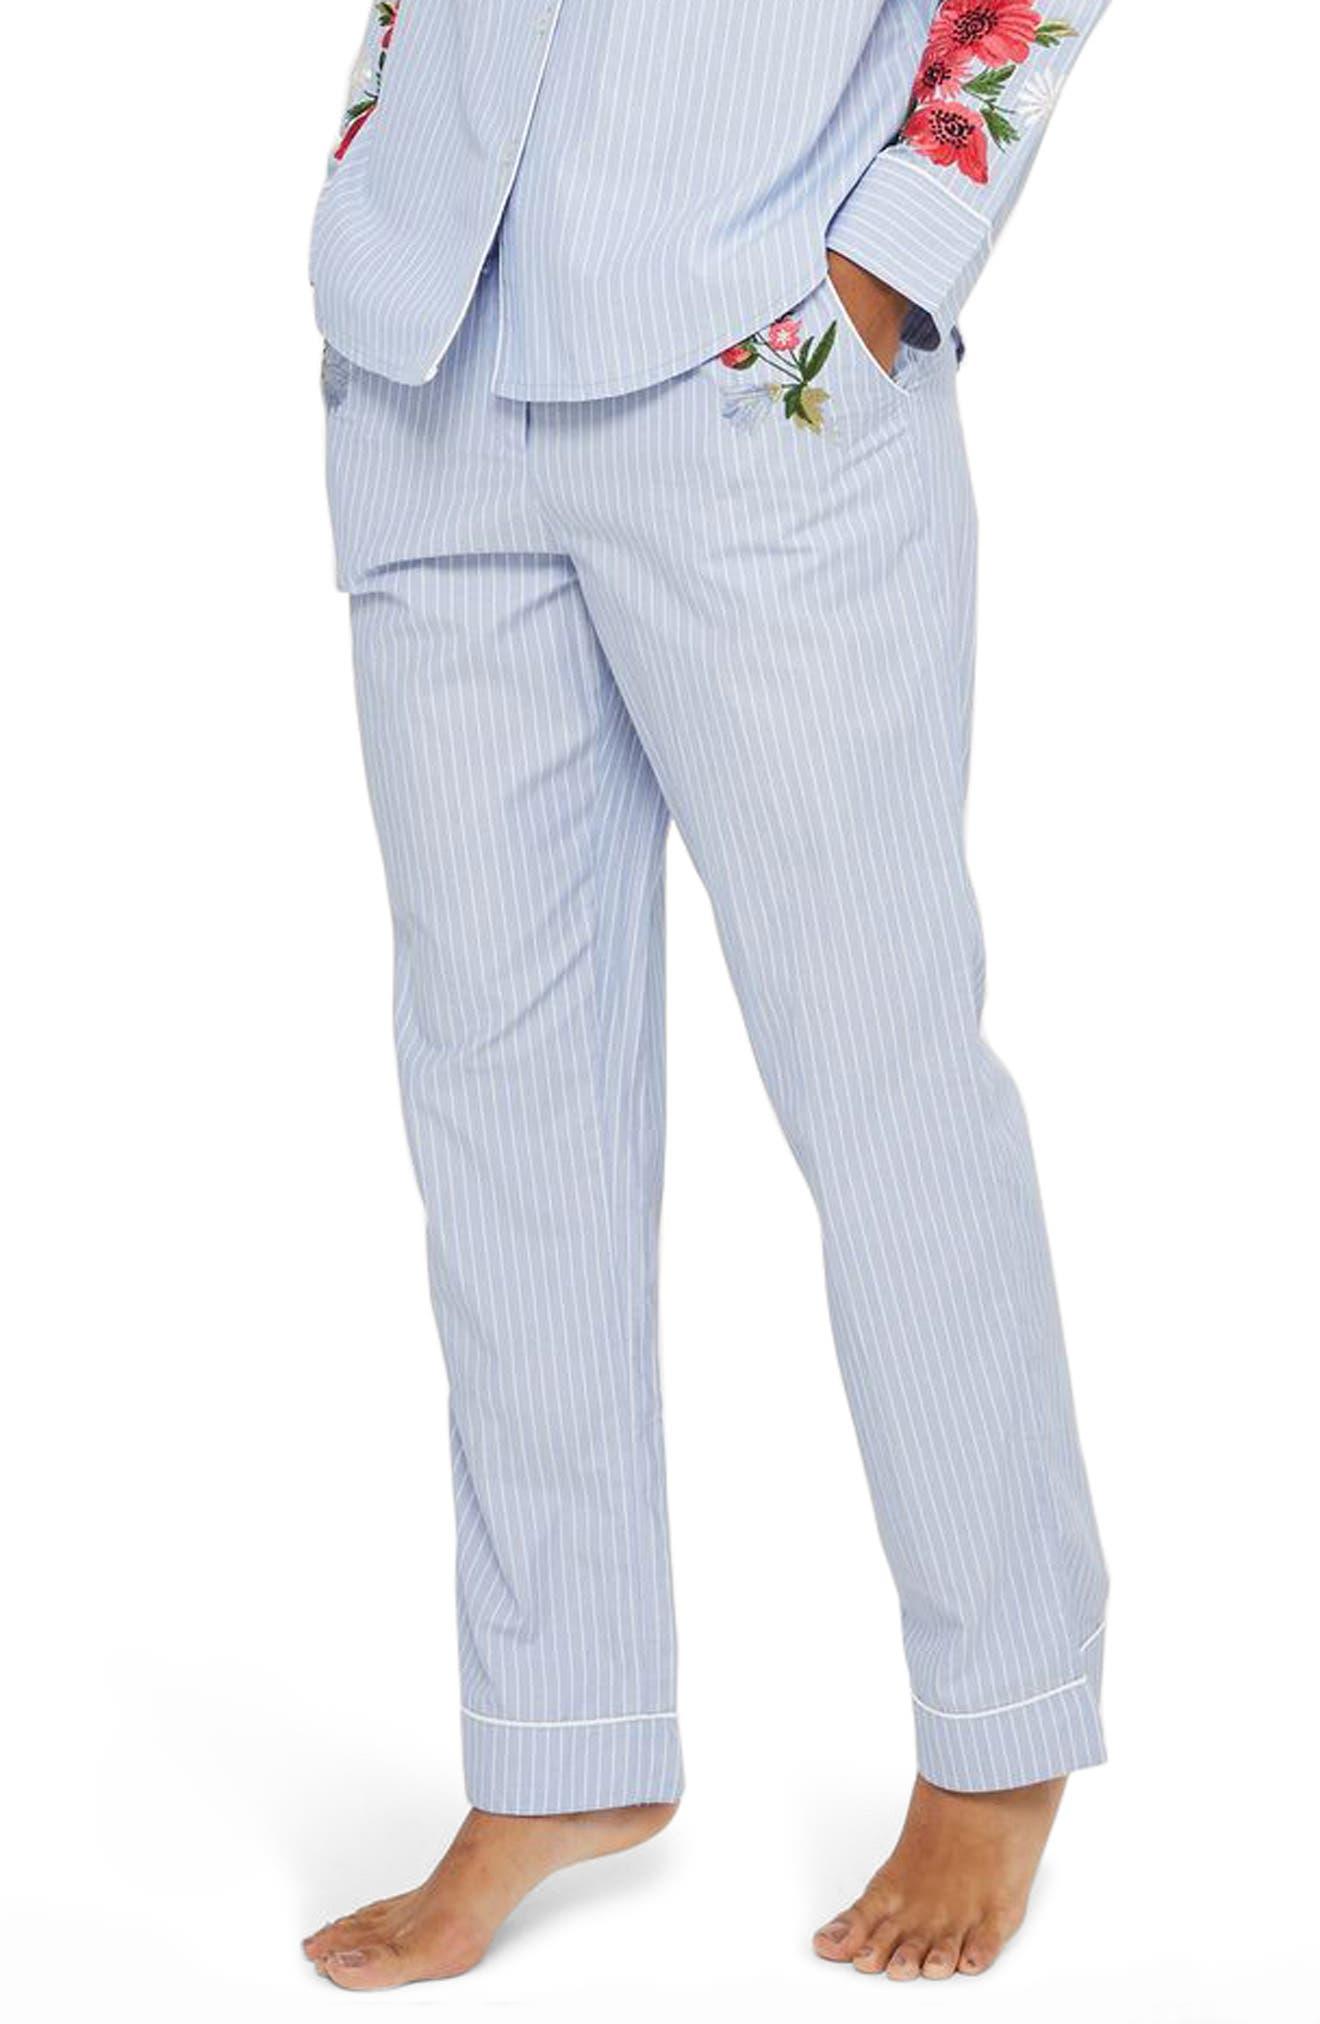 Floral Embroidered Stripe Pajama Pants,                             Main thumbnail 1, color,                             Blue Multi